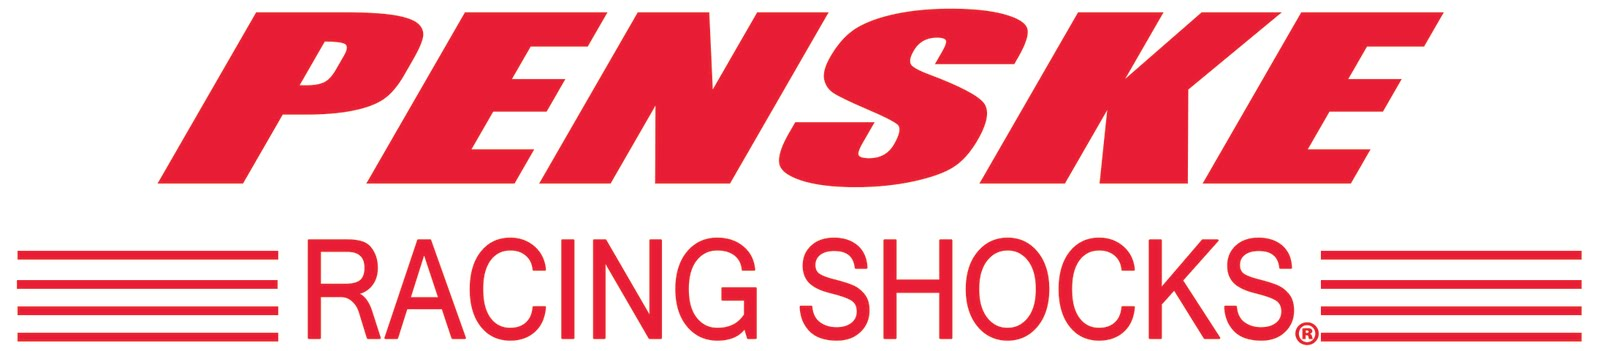 Penske logo